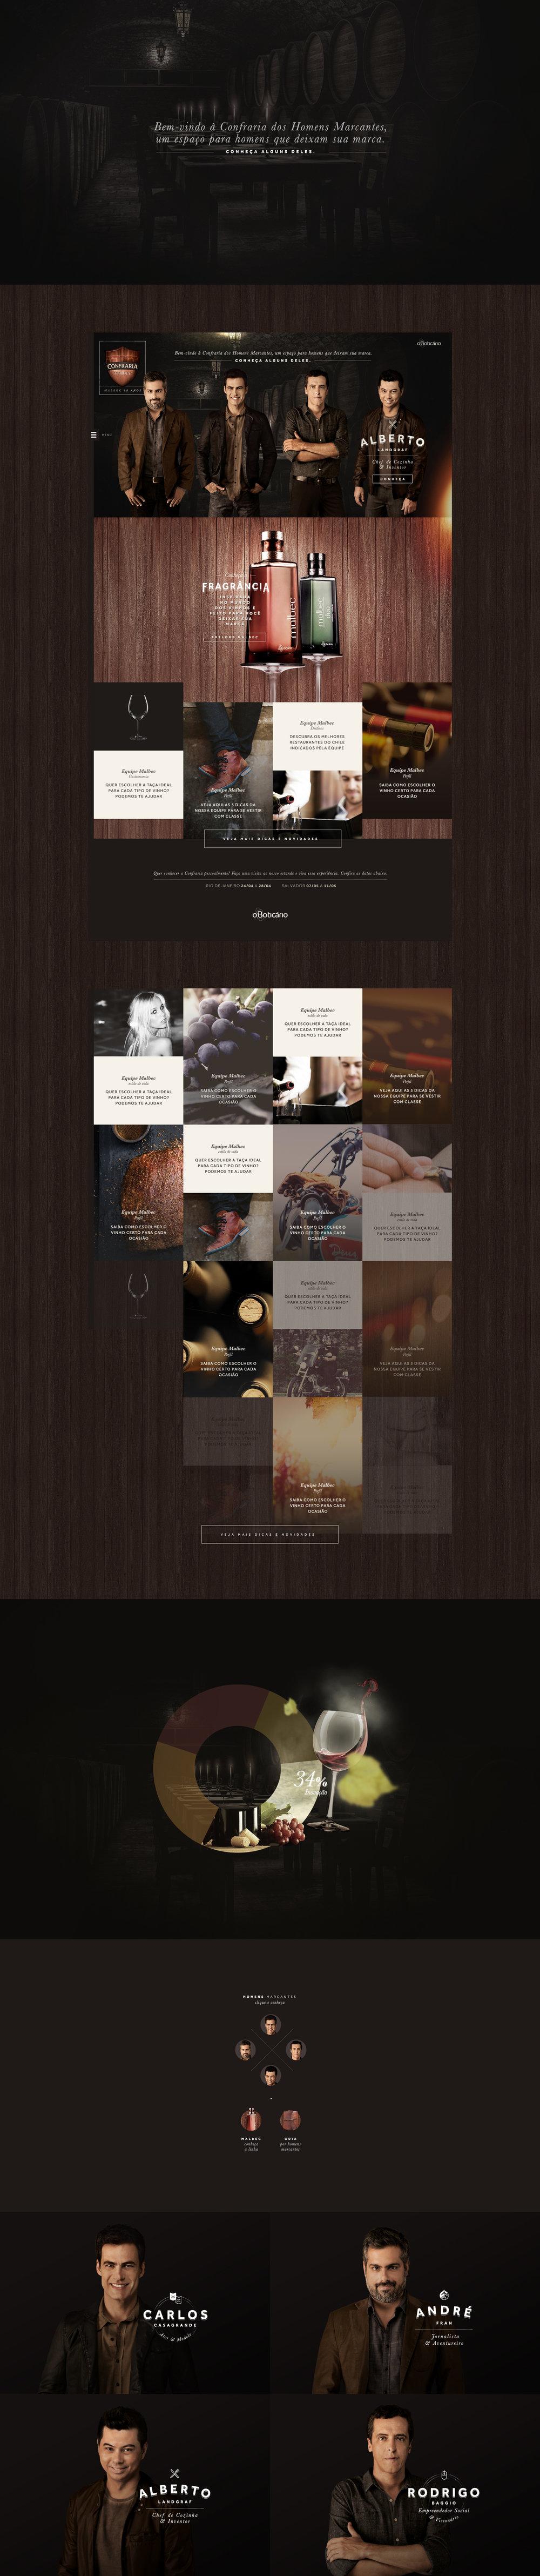 O Boticário, Malbec, Interface Design